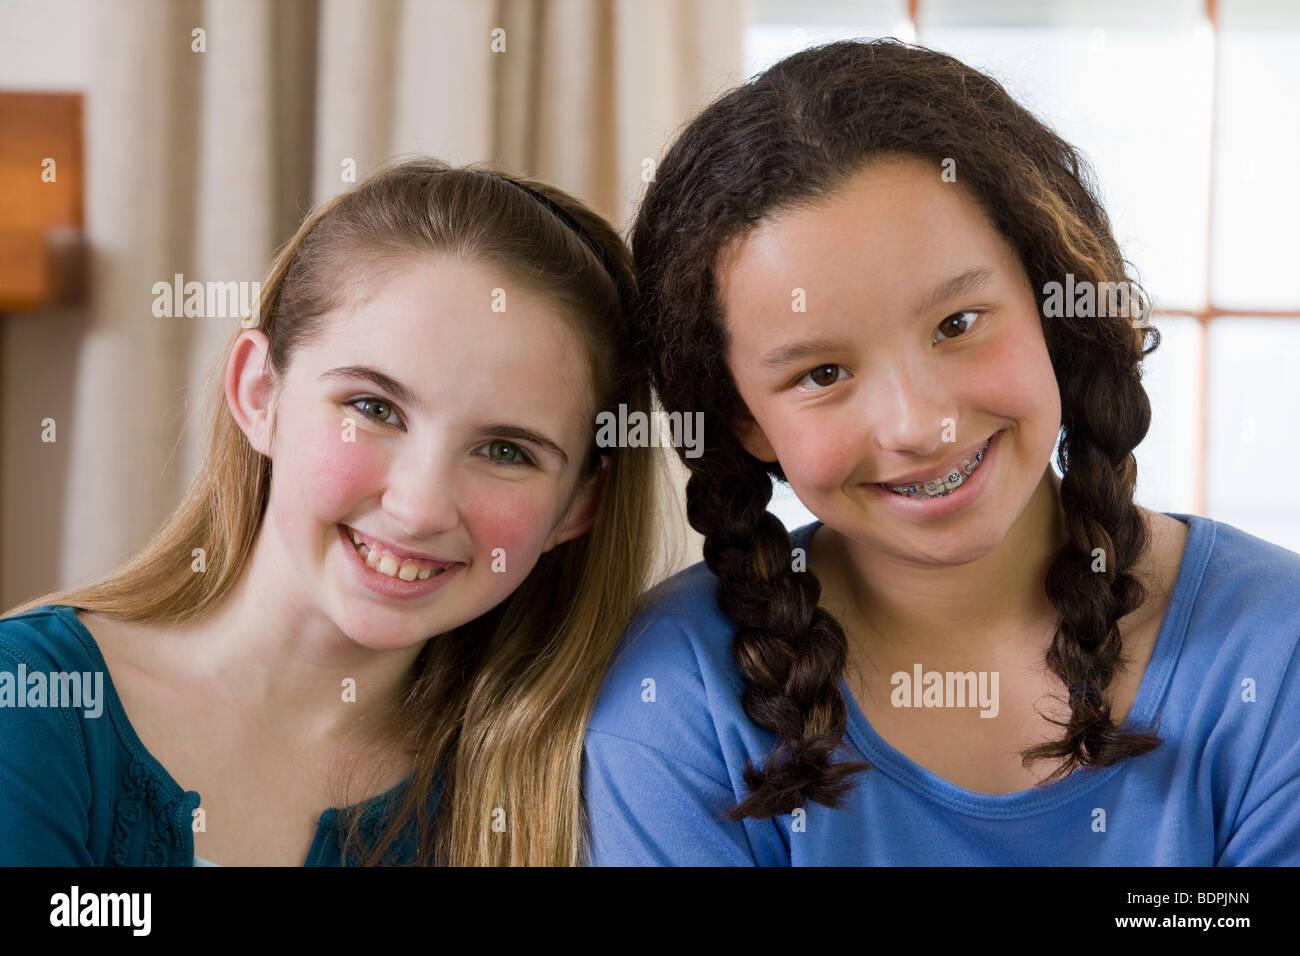 Retrato de dos chicas sonrientes Foto de stock